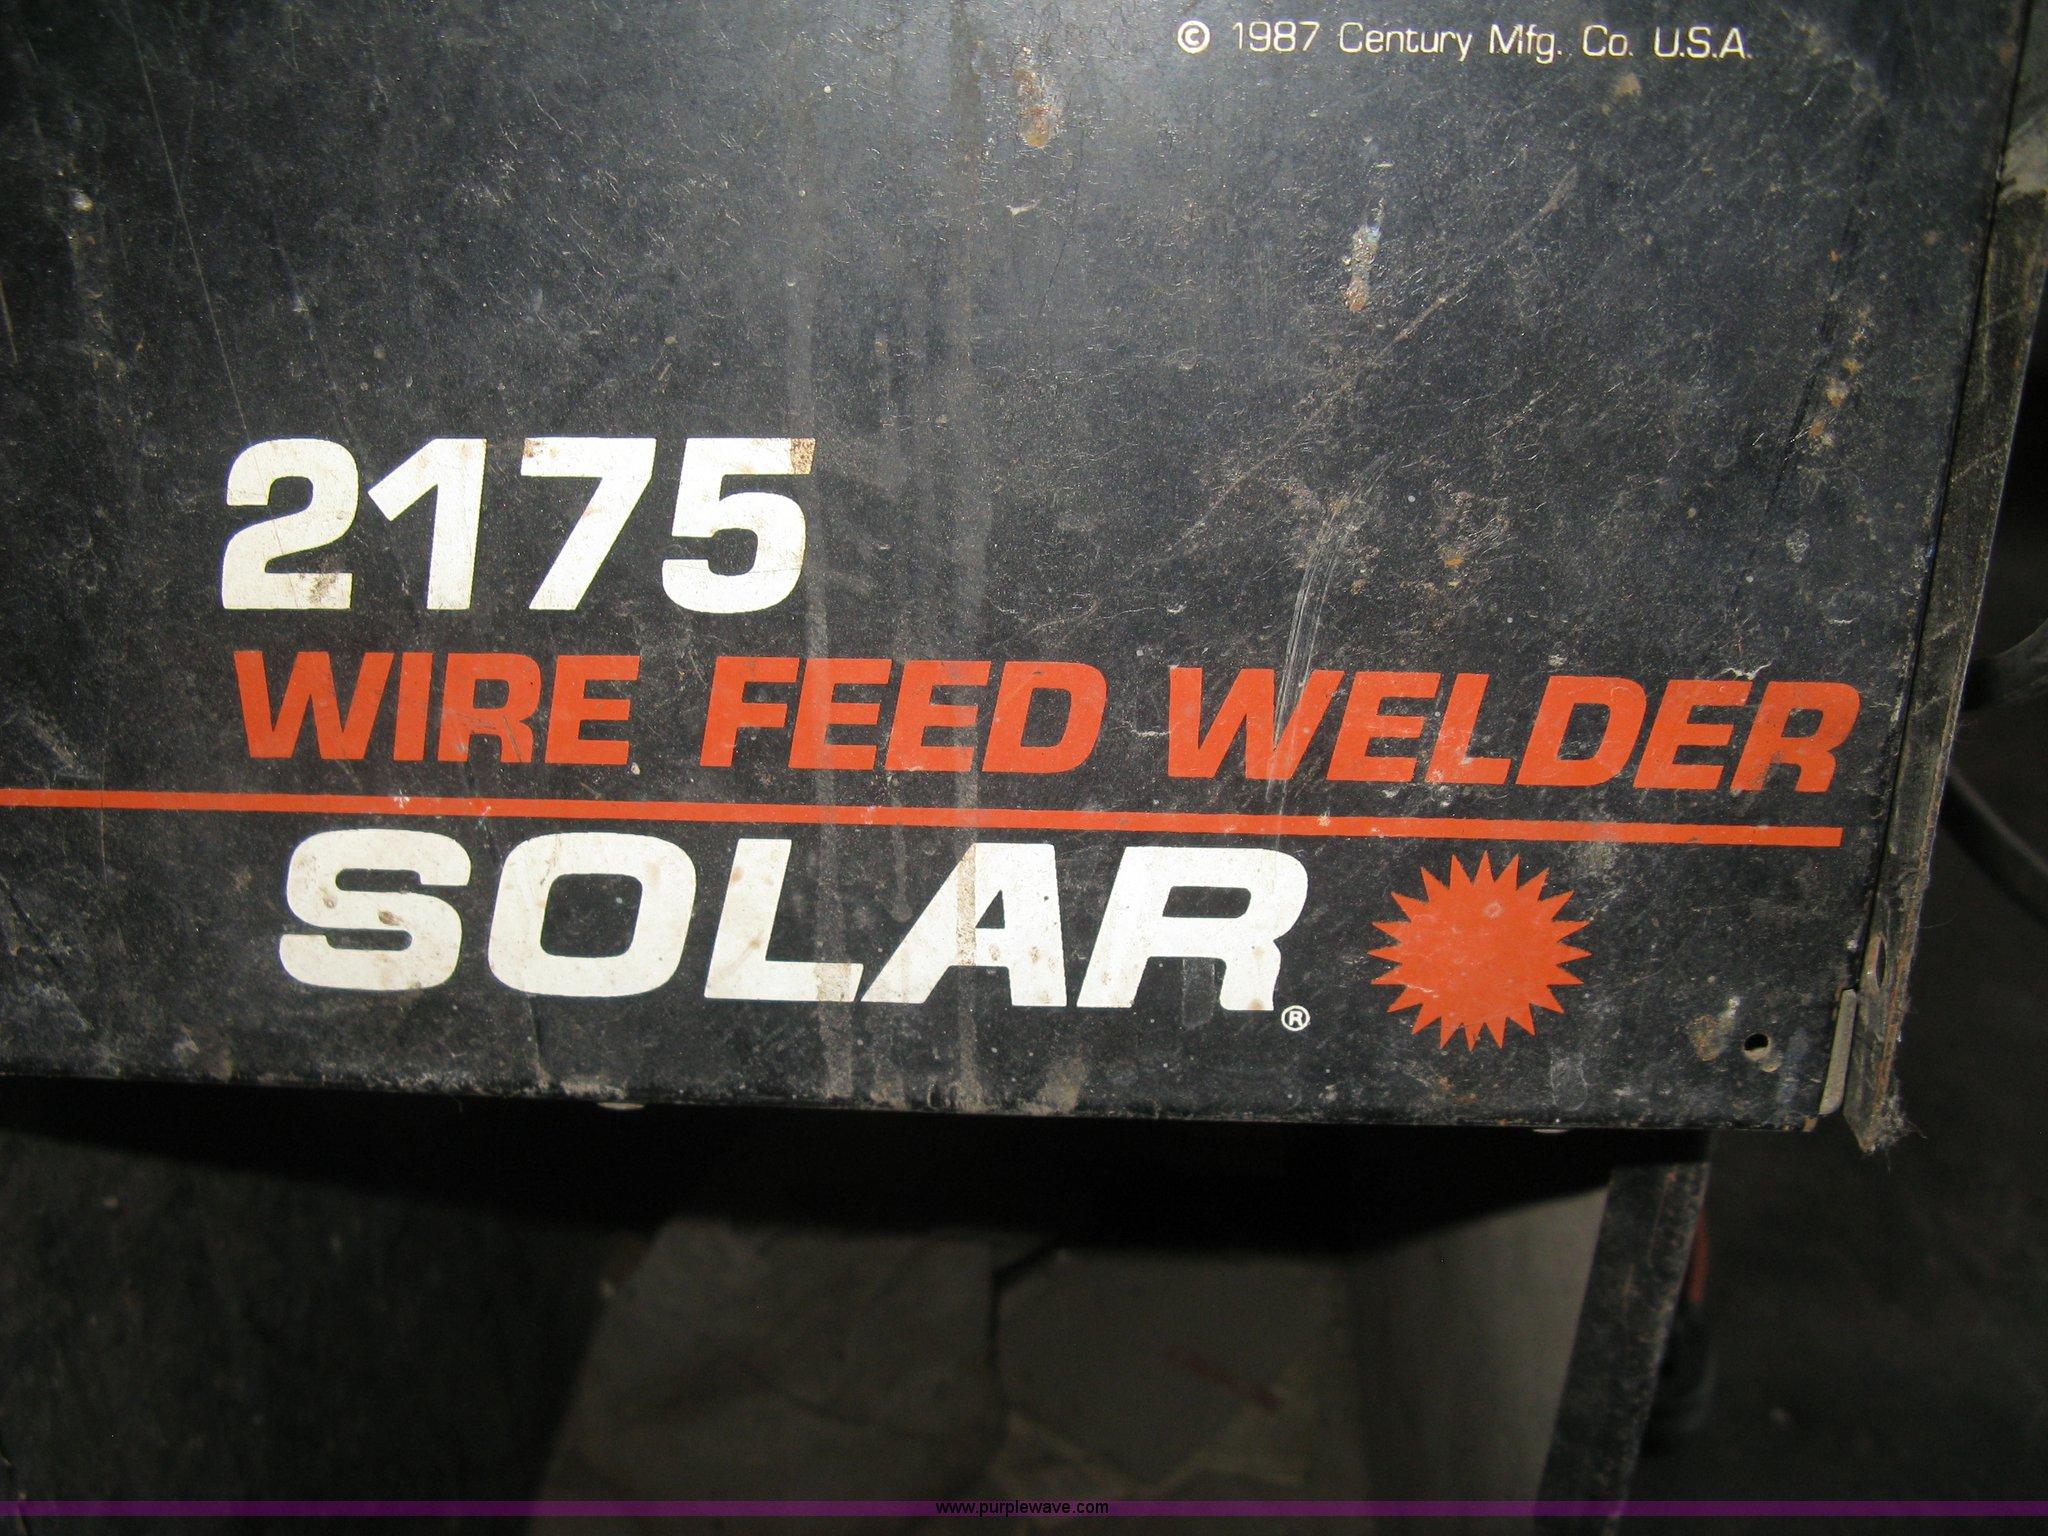 solar 2175 welder wiring diagrams solar 2175 wire feed welder in newton  ks item ax9917 sold  solar 2175 wire feed welder in newton